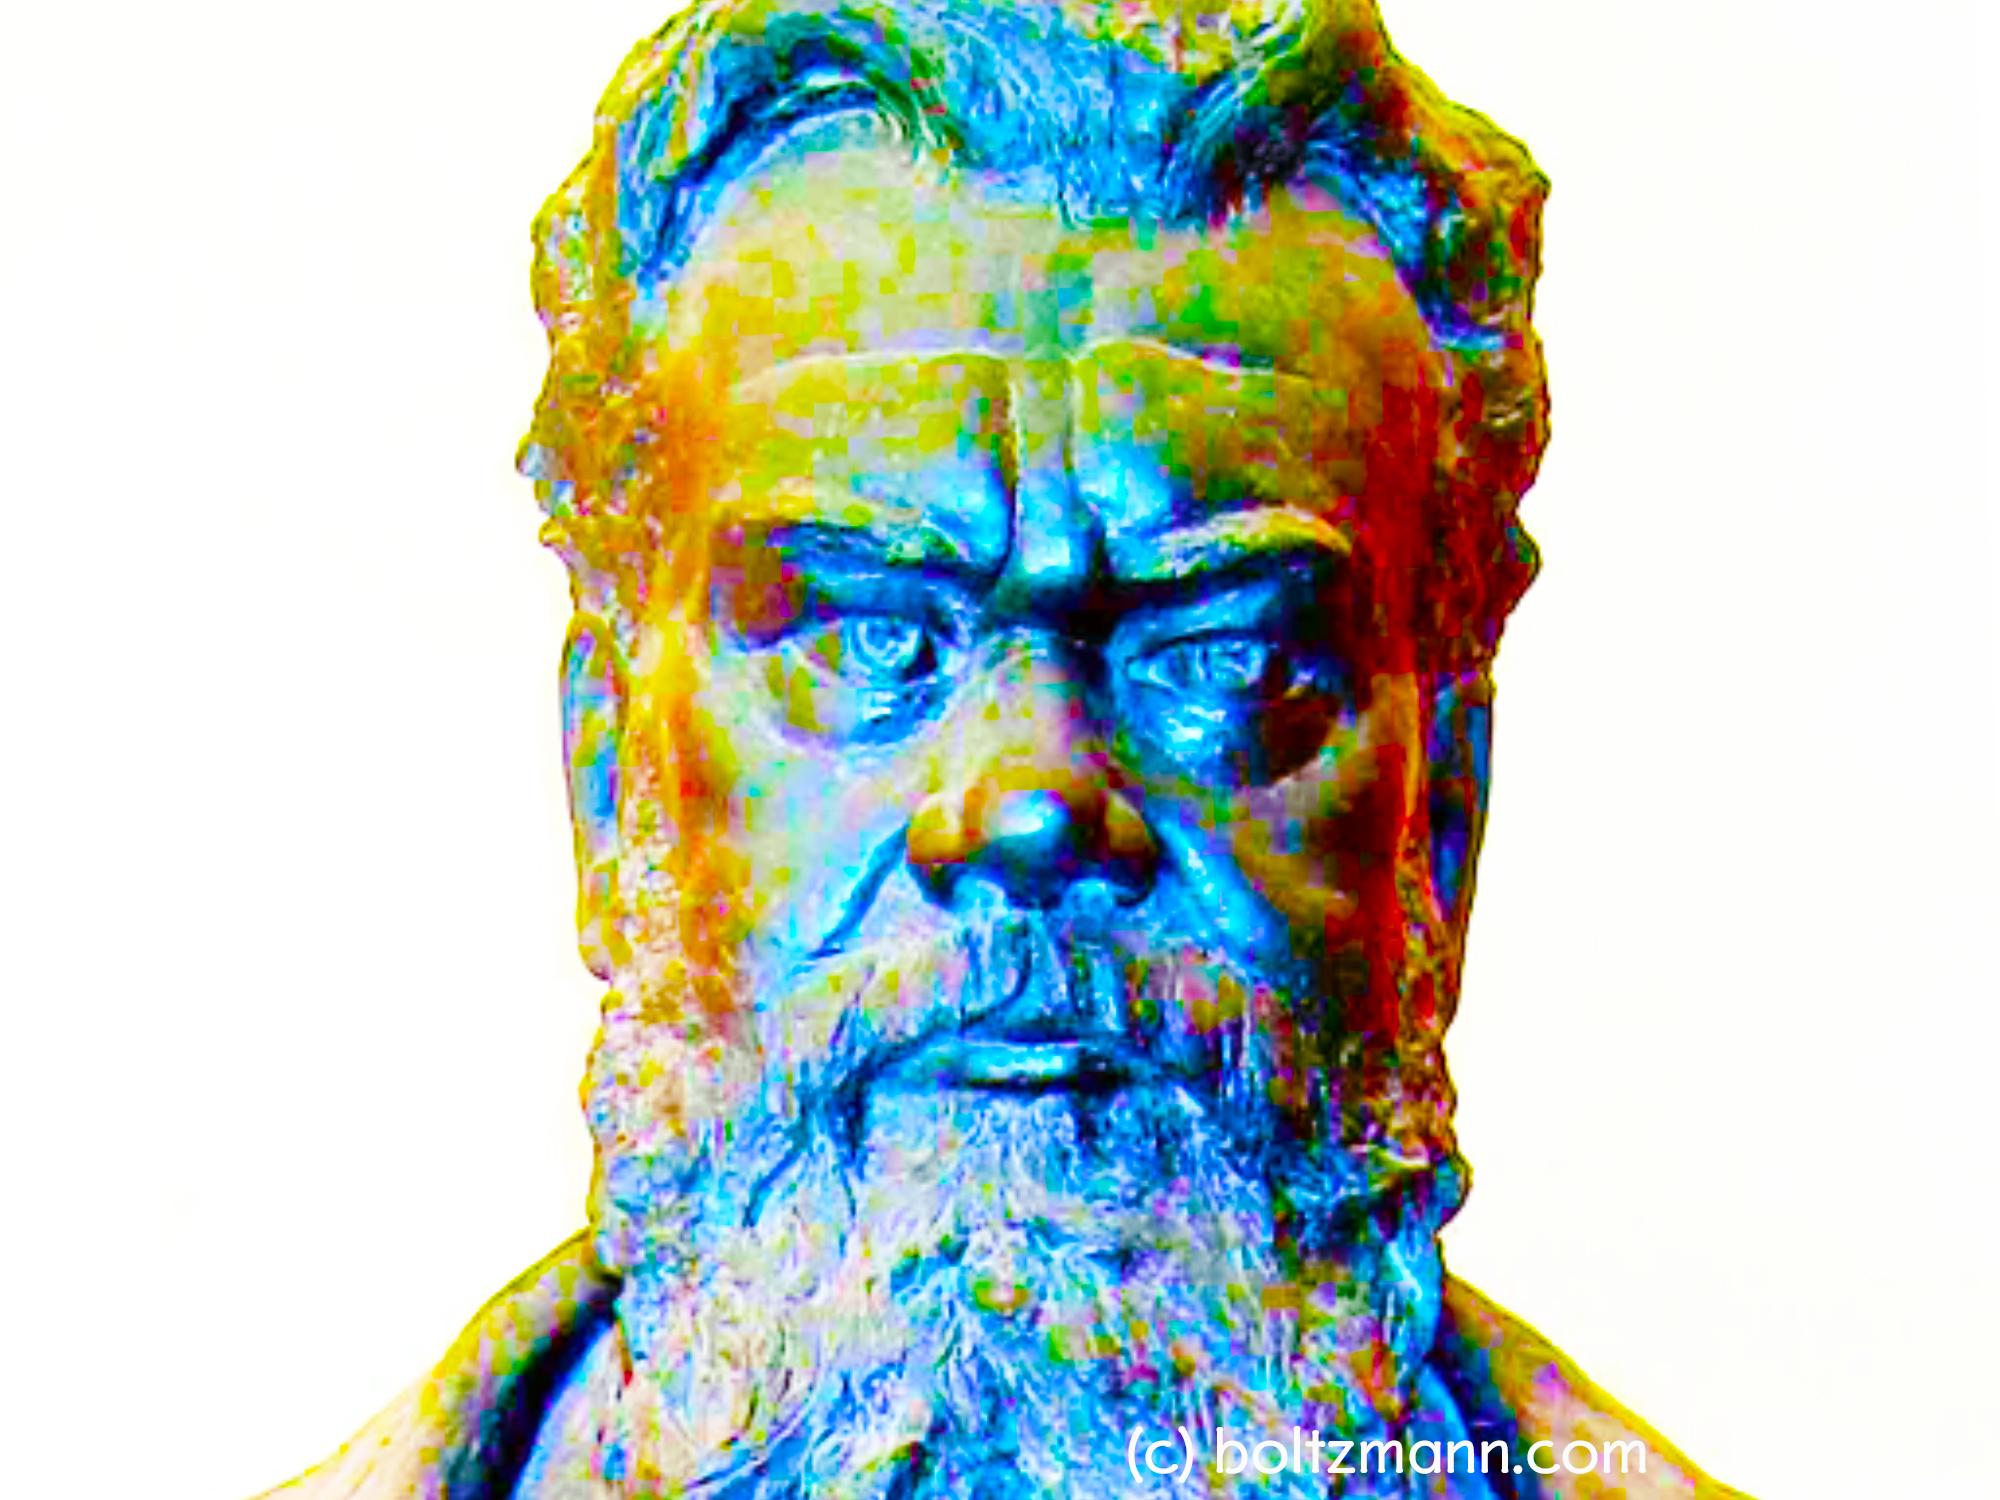 Ludwig Boltzmann Boltzmann.com